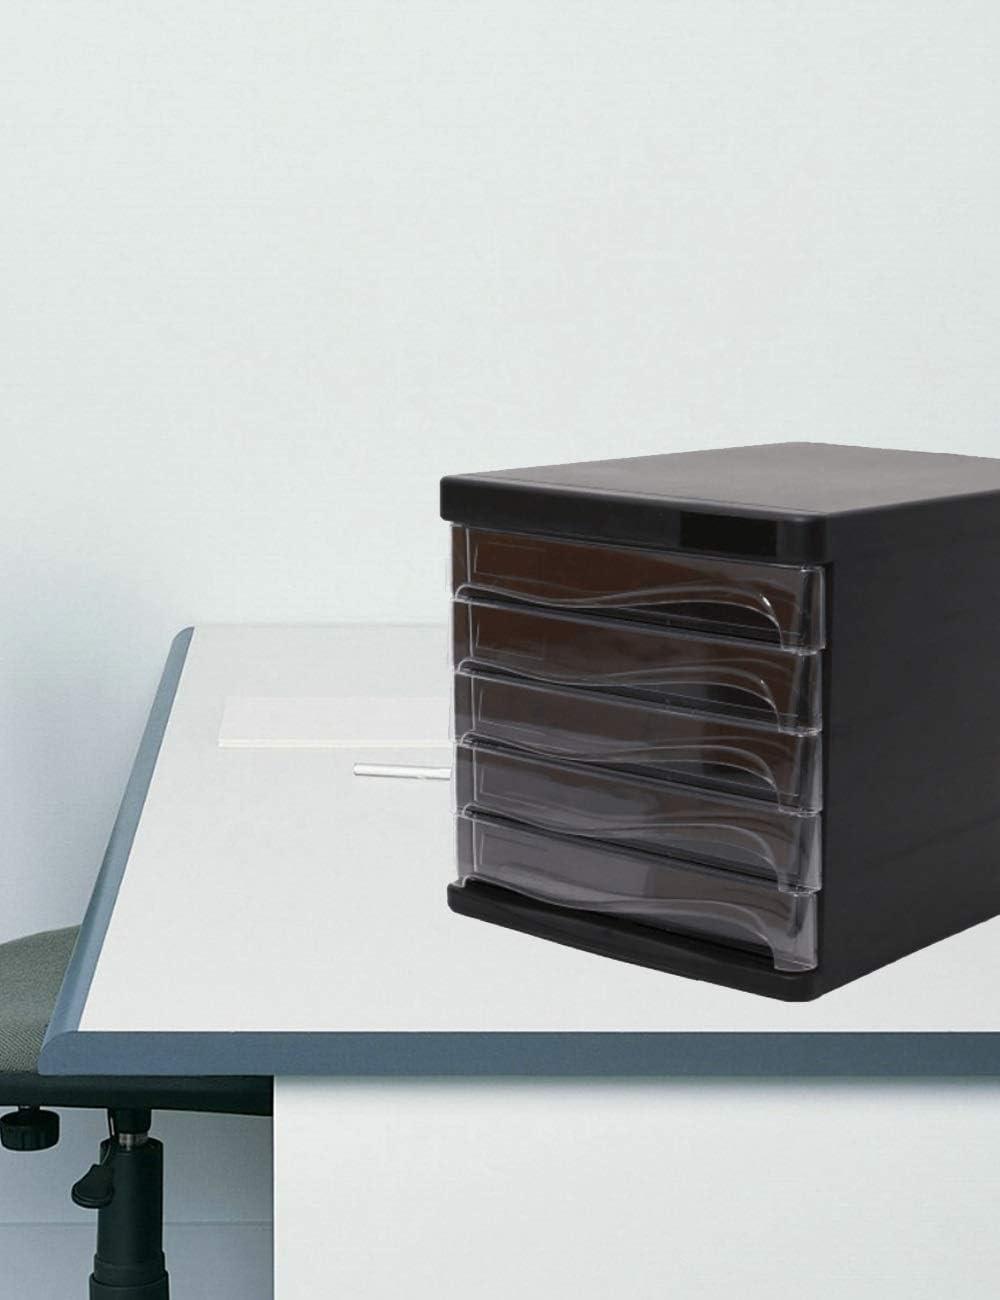 File Cabinets Office Desktop Cabinet 5 Drawers 35.526.525.7cm Color : A cm Plastic Safety Cabinet File Storage Cabinet Storage Box Home Office Furniture